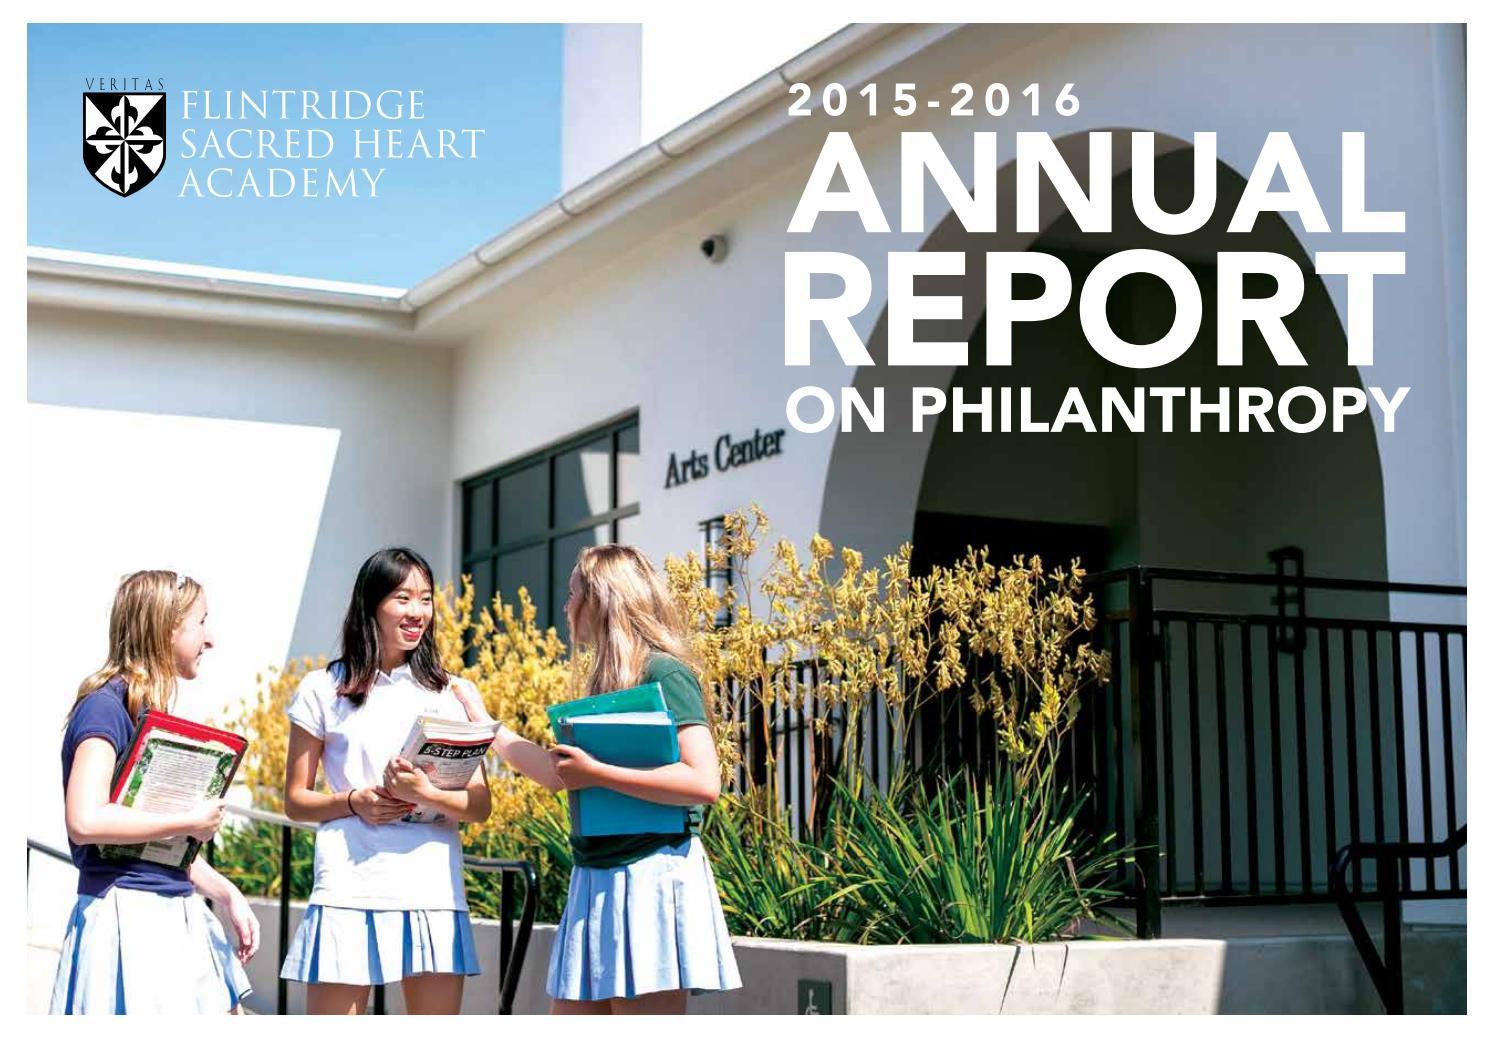 Flintridge Sacred Heart Academy Annual Report 2015-16 by